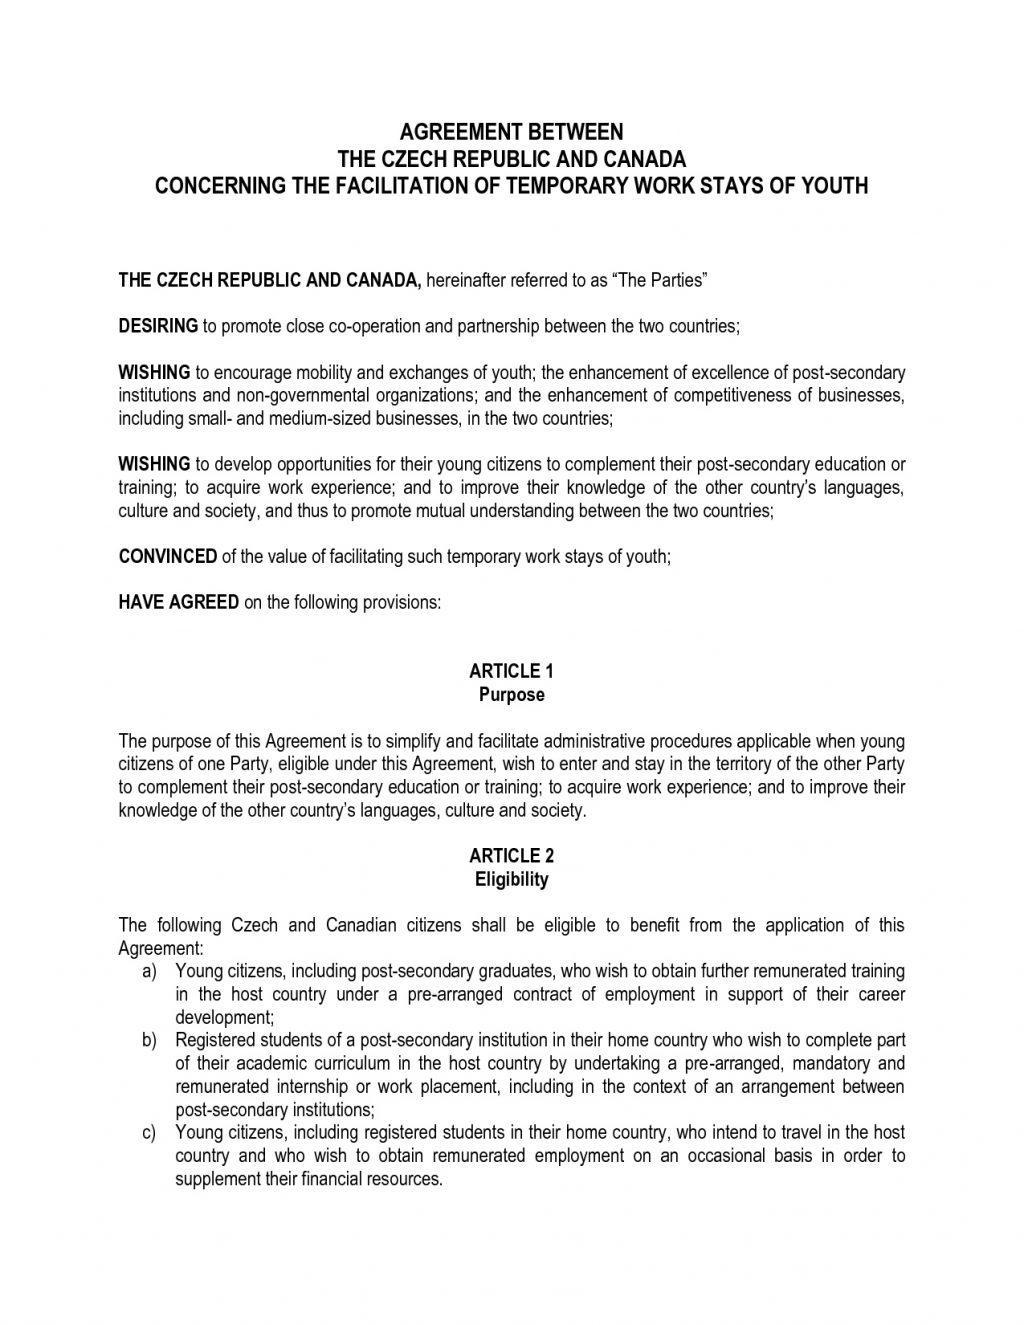 Free Binding Financial Agreement Template Australia